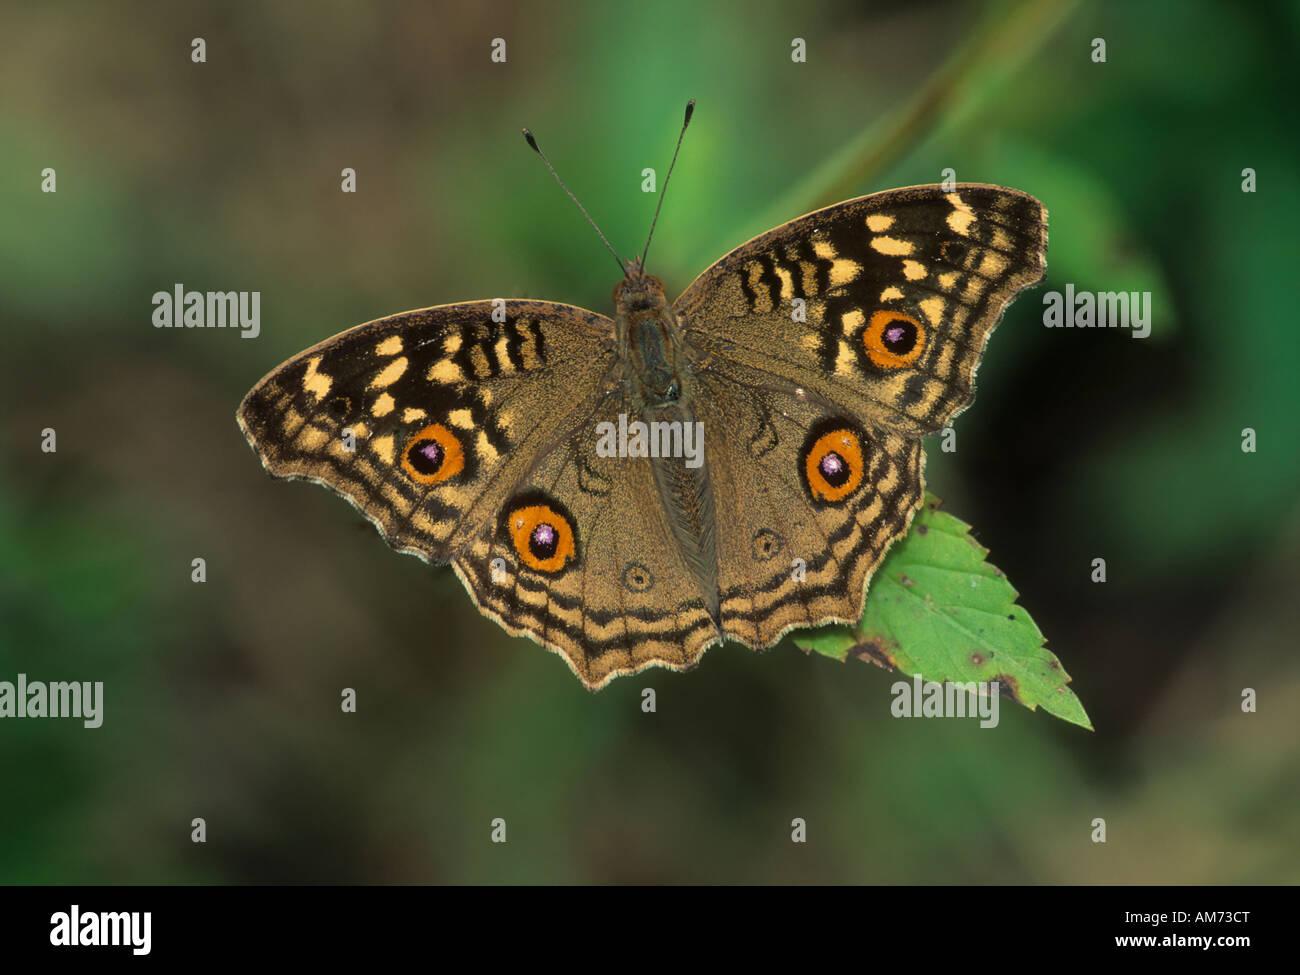 Indian farfalla pavone (Inachis) Keoladeo Ghana, Baratpur, India Immagini Stock